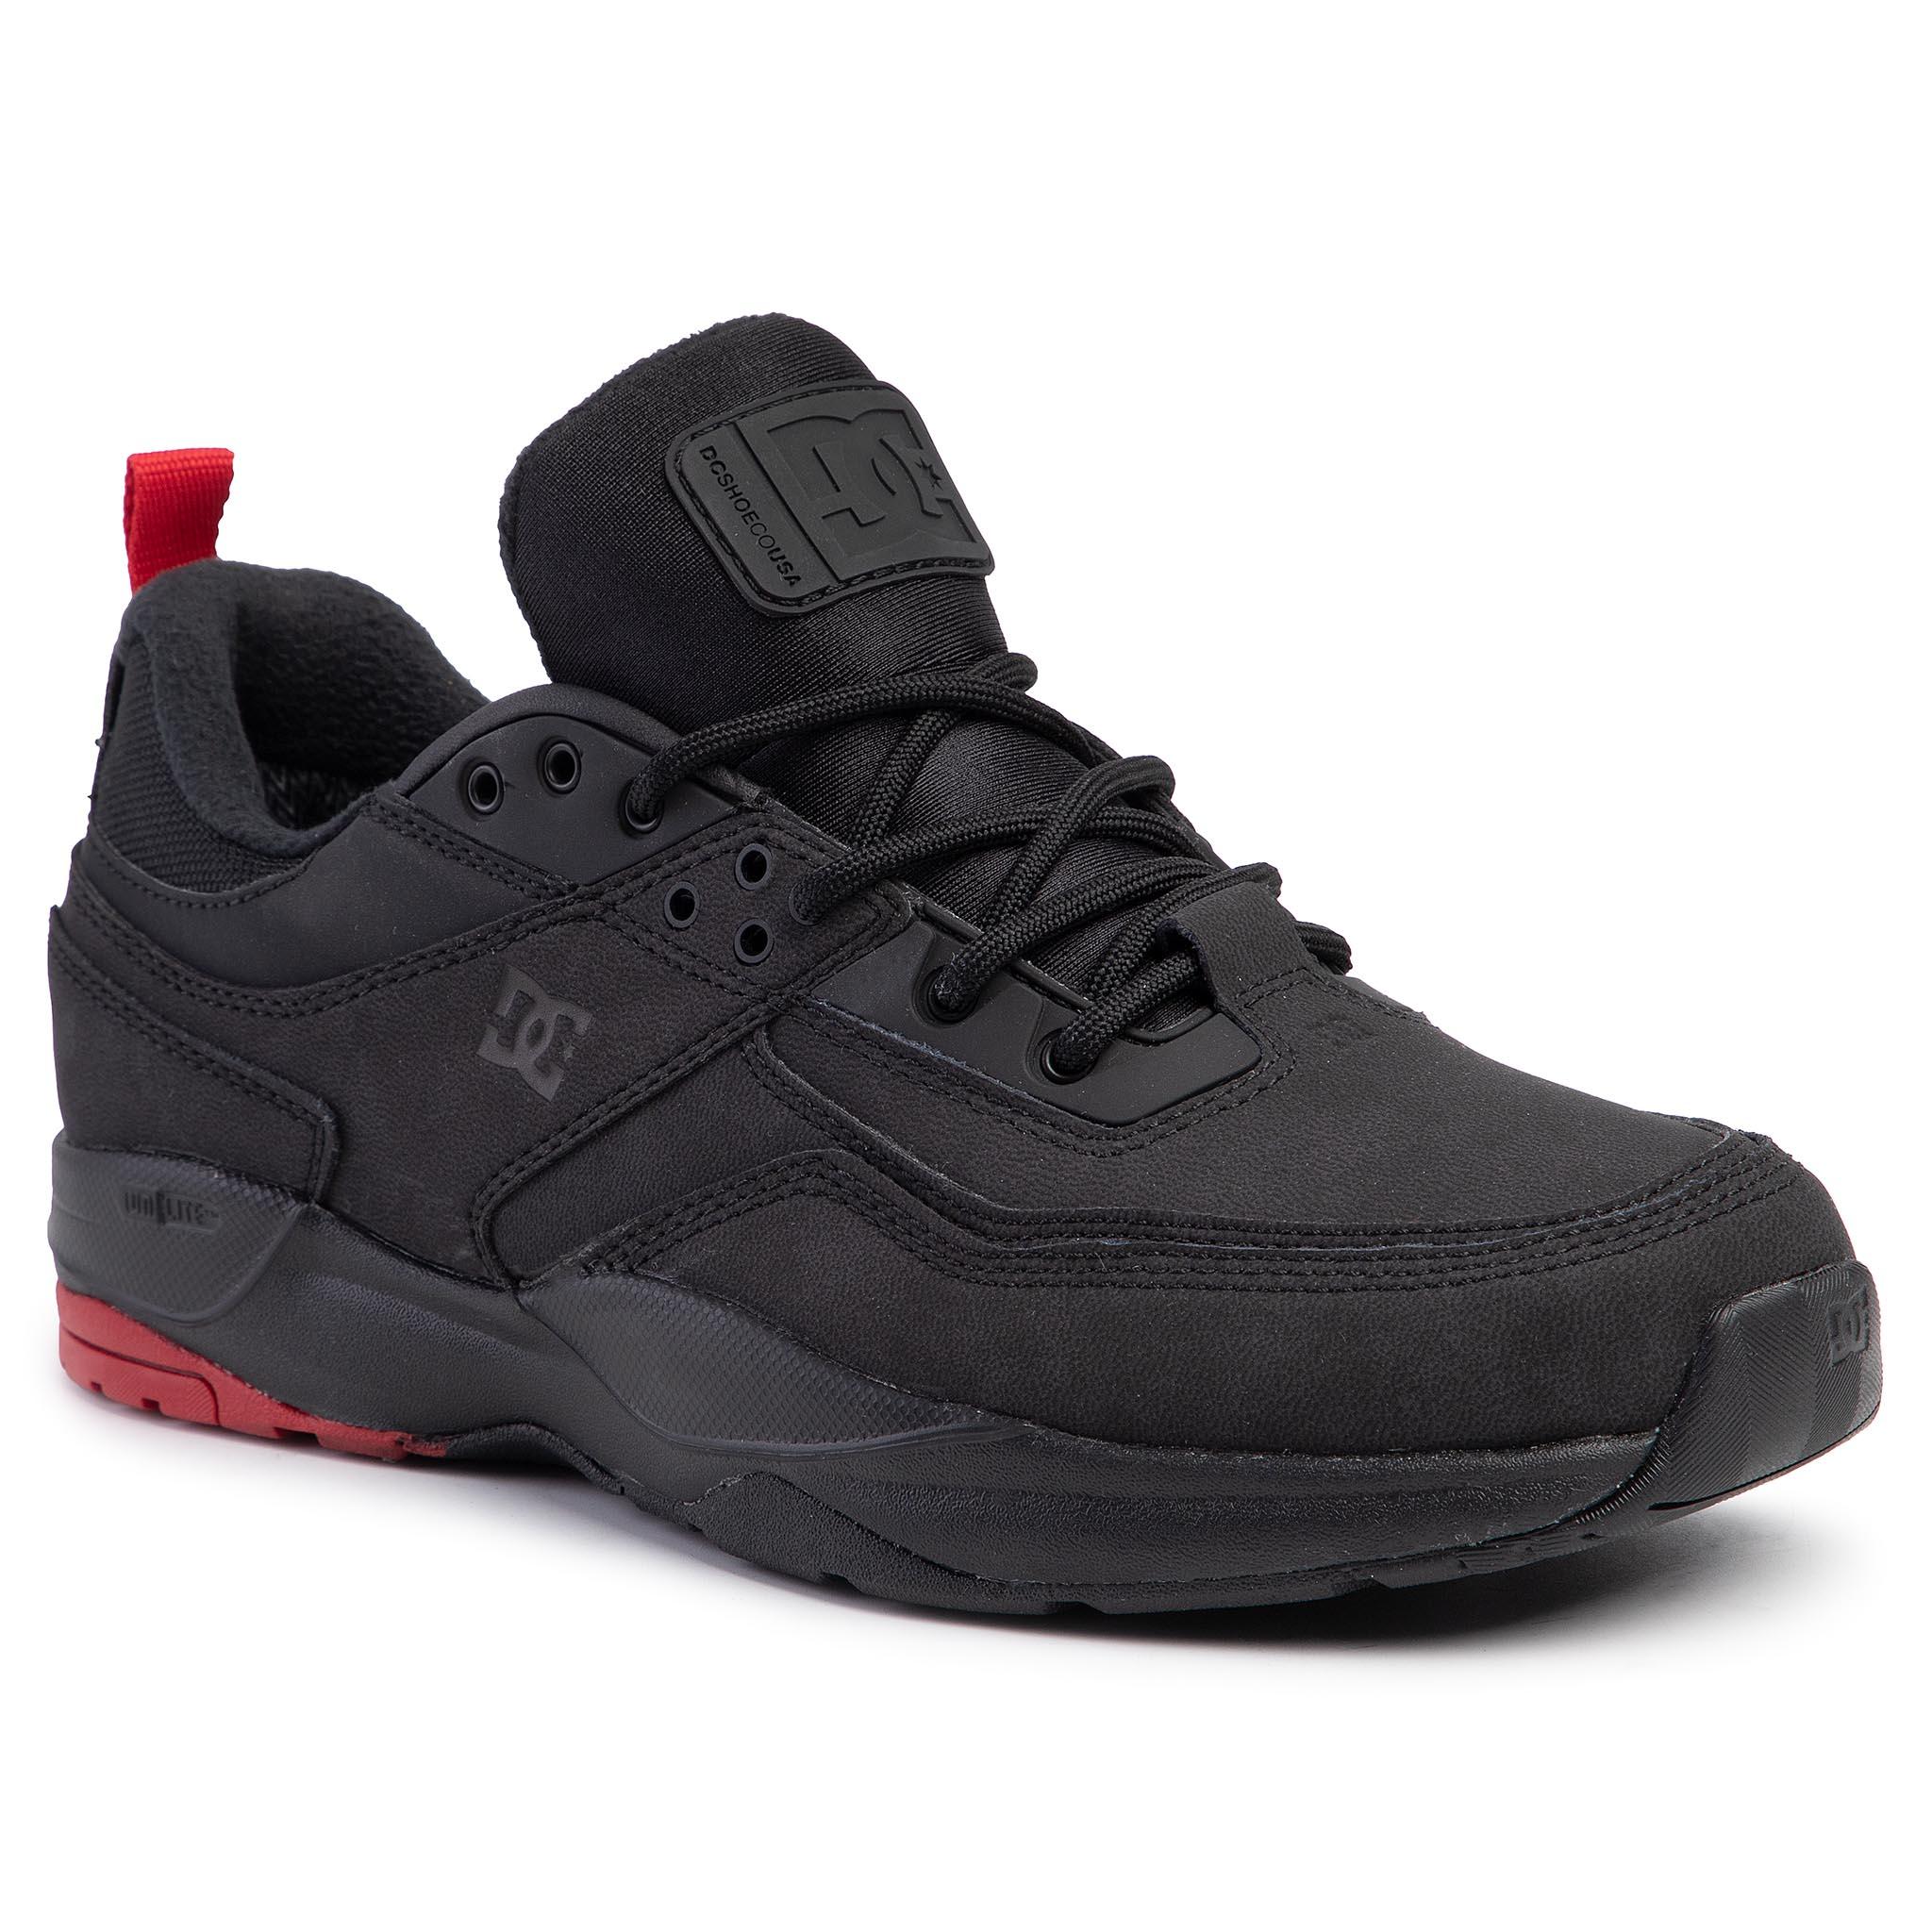 Sneakersy DC - E.Tribeka Wnt ADYS700206 Black/Black/Red (Xkkr)